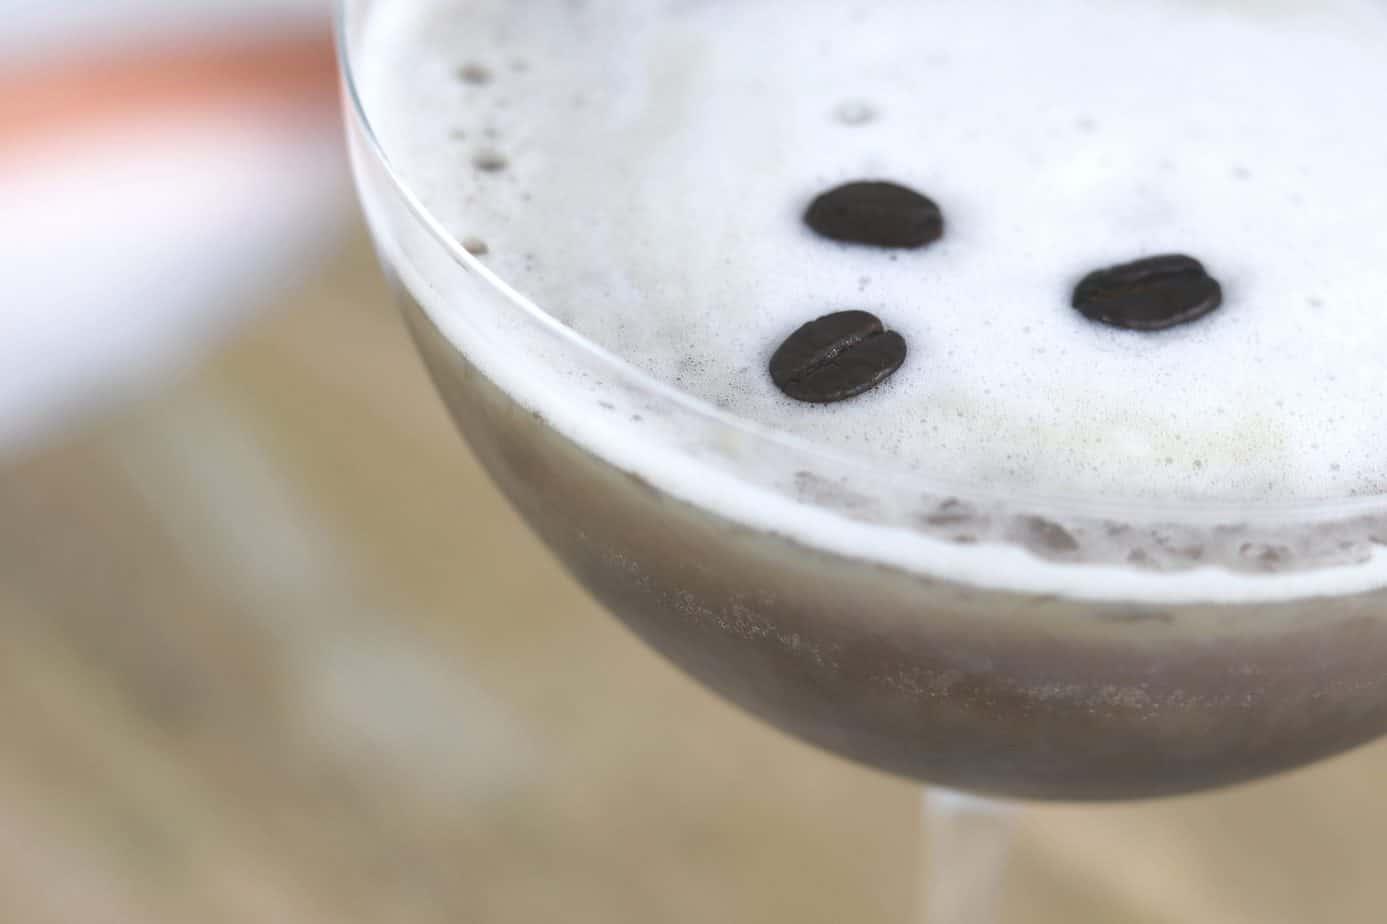 espresso martini with 3 coffee beans